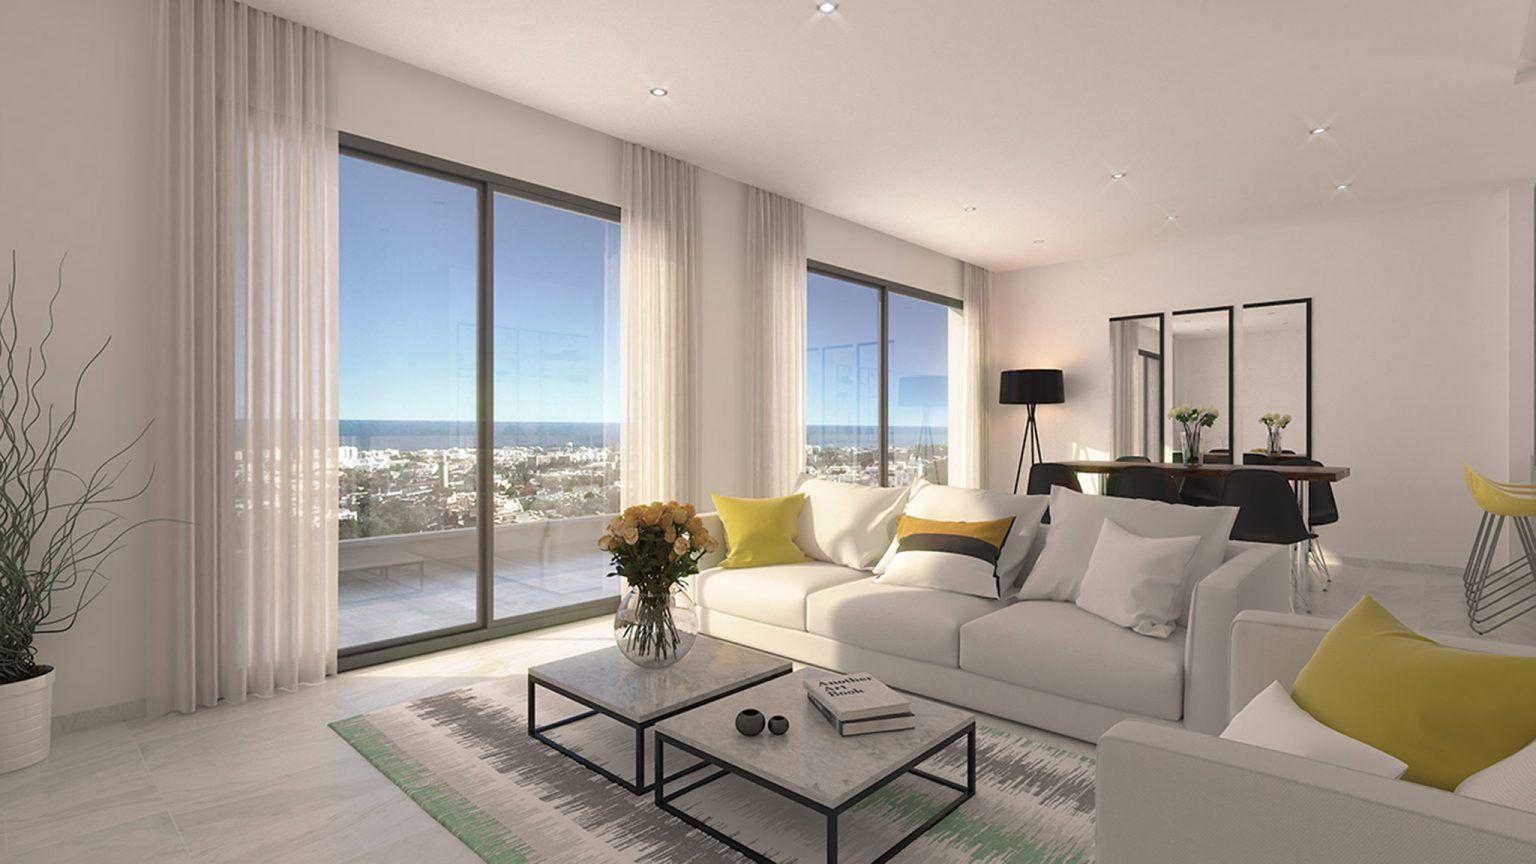 AVS01147-Apartments-canada-07